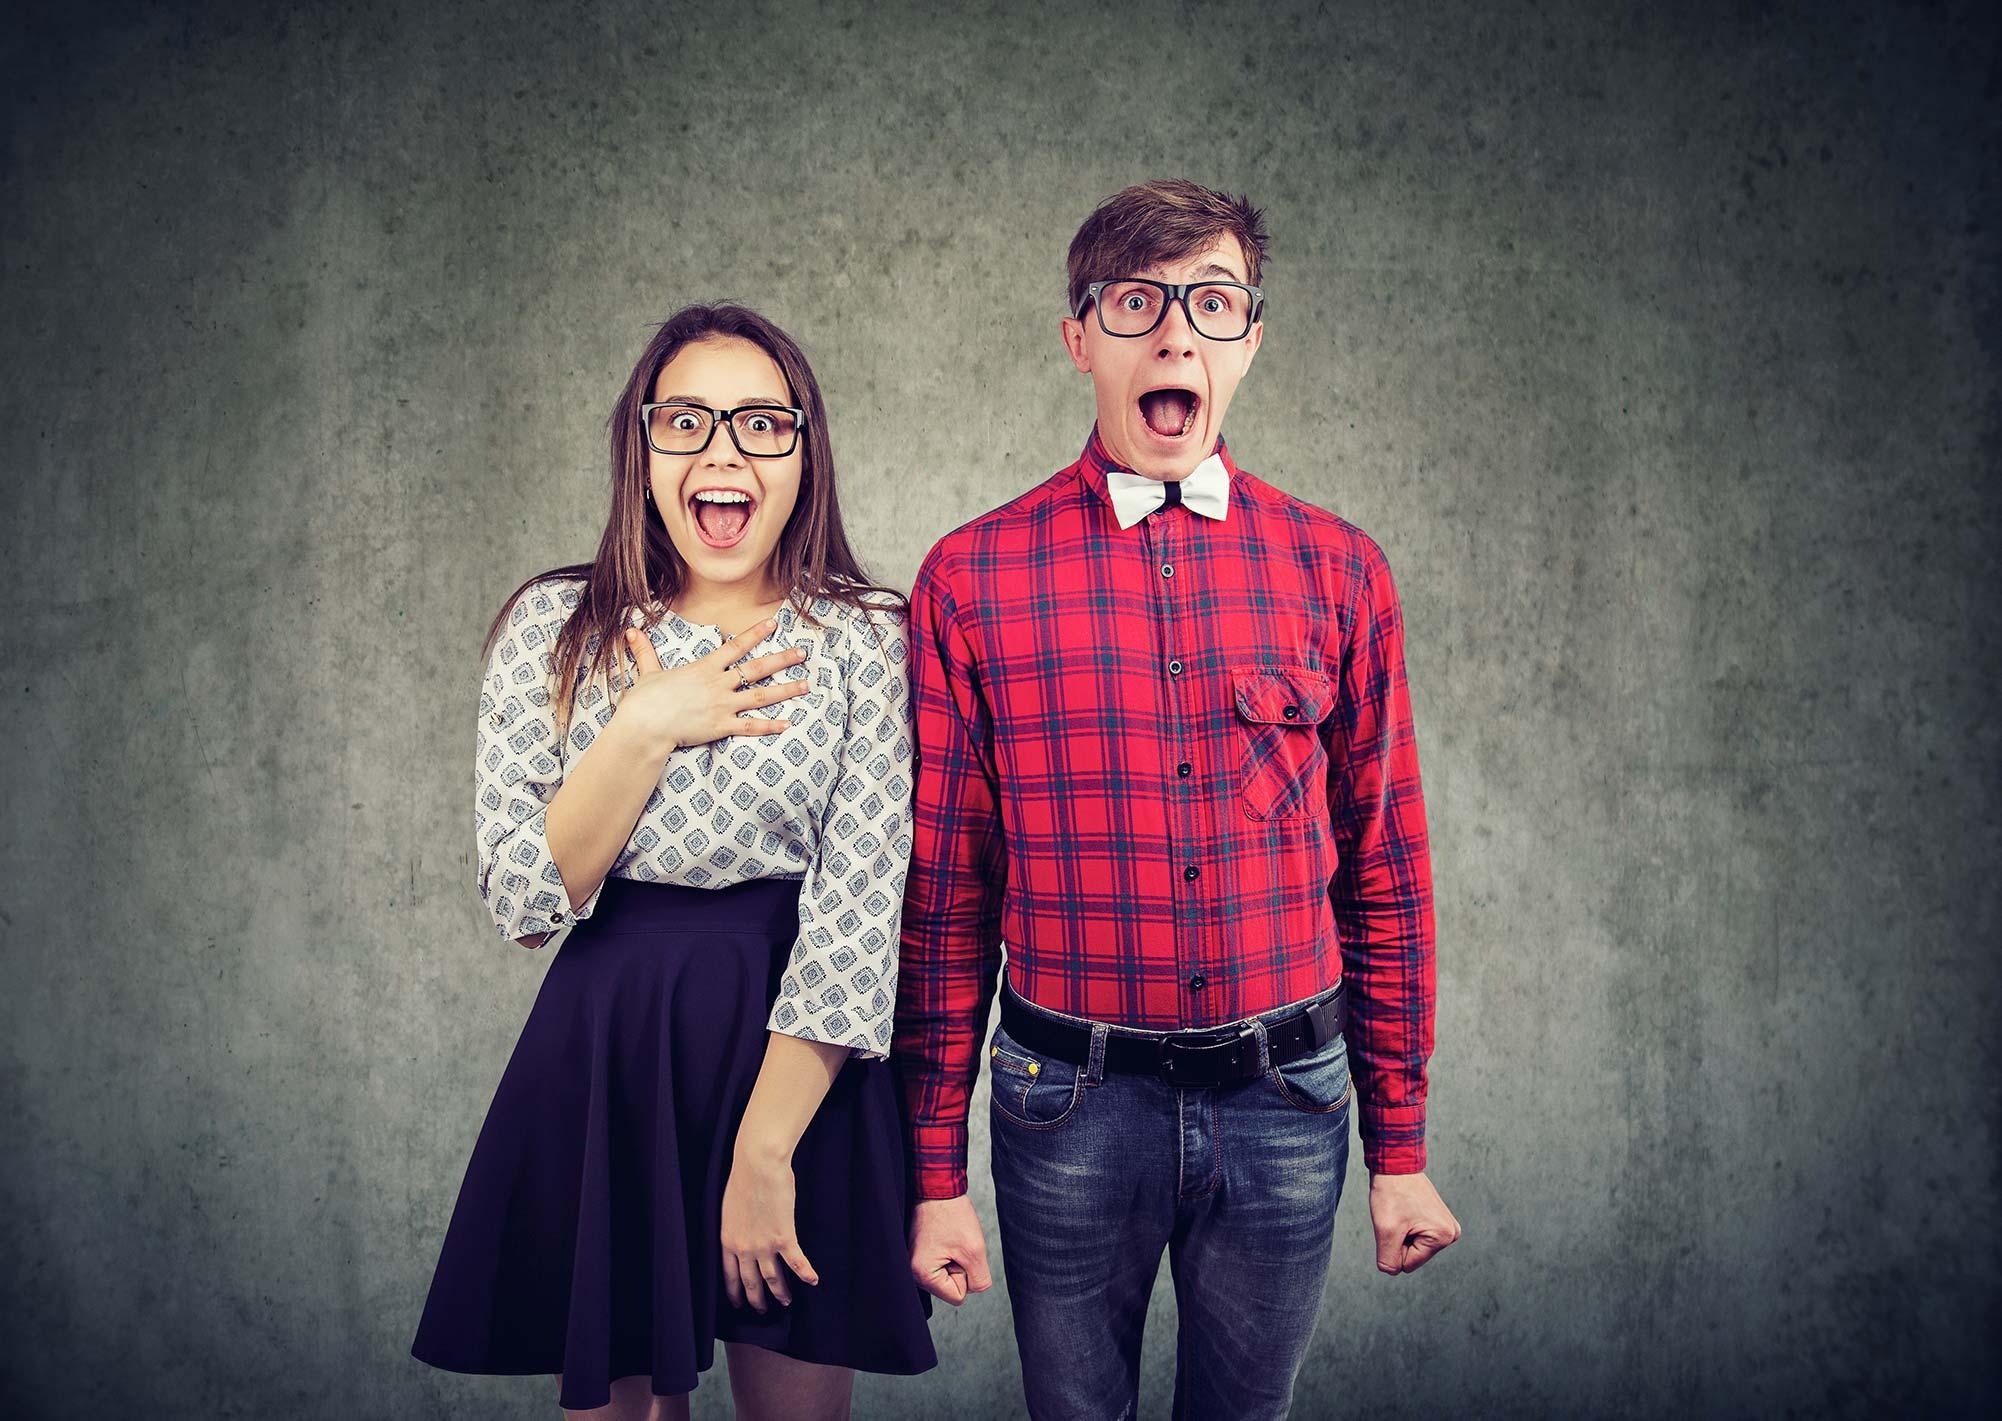 Unique couple excited about hiring graphic designer